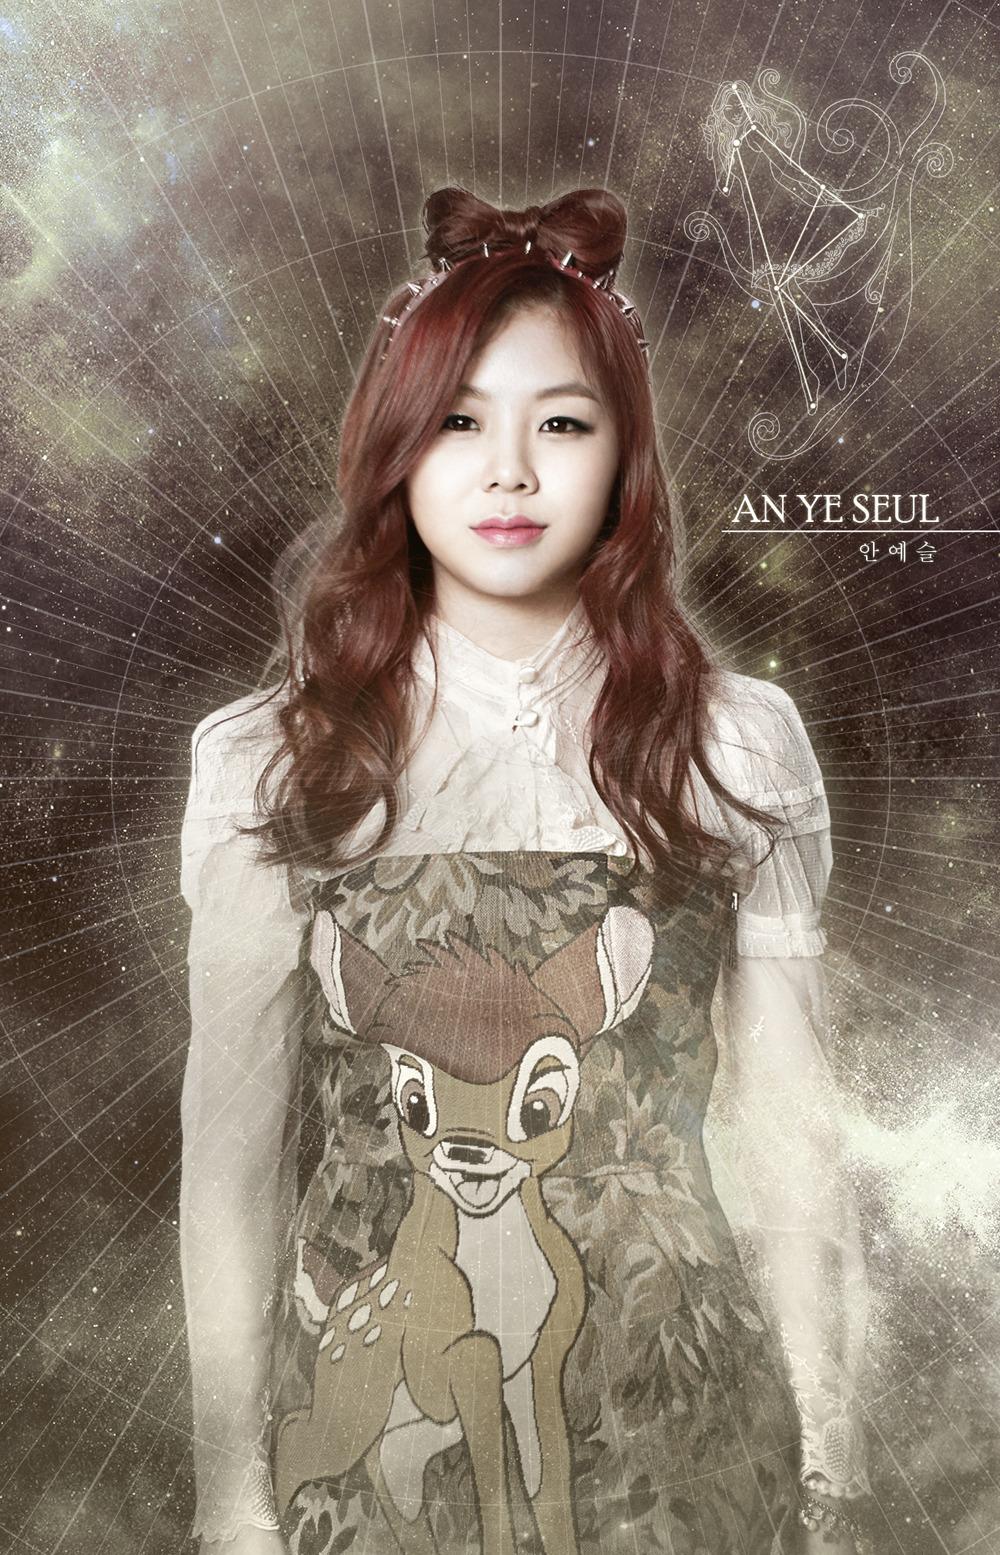 Ahn Ye Seul